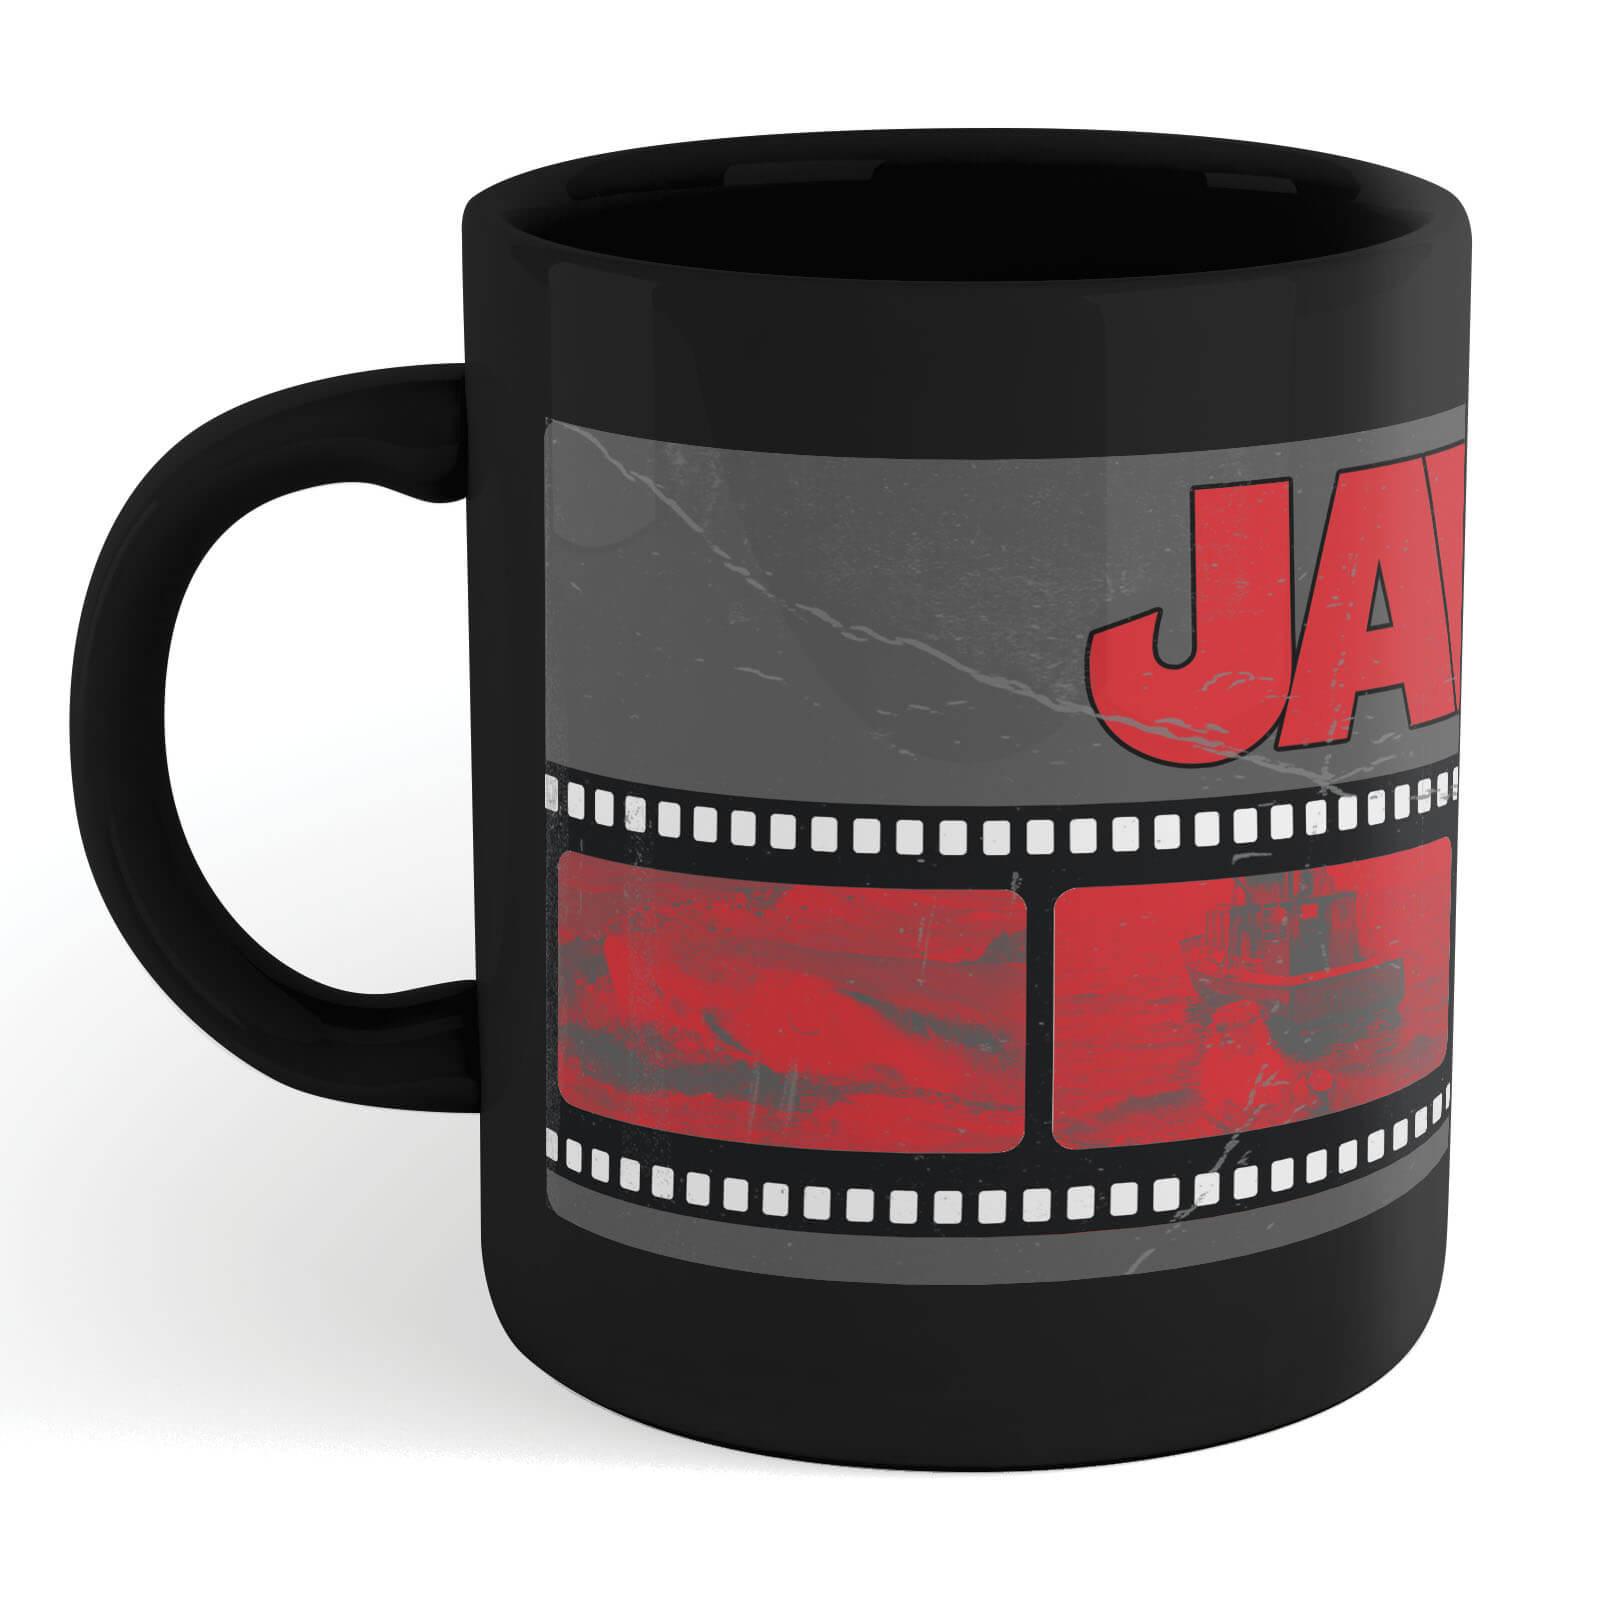 Jaws Film Reel Mug - Black